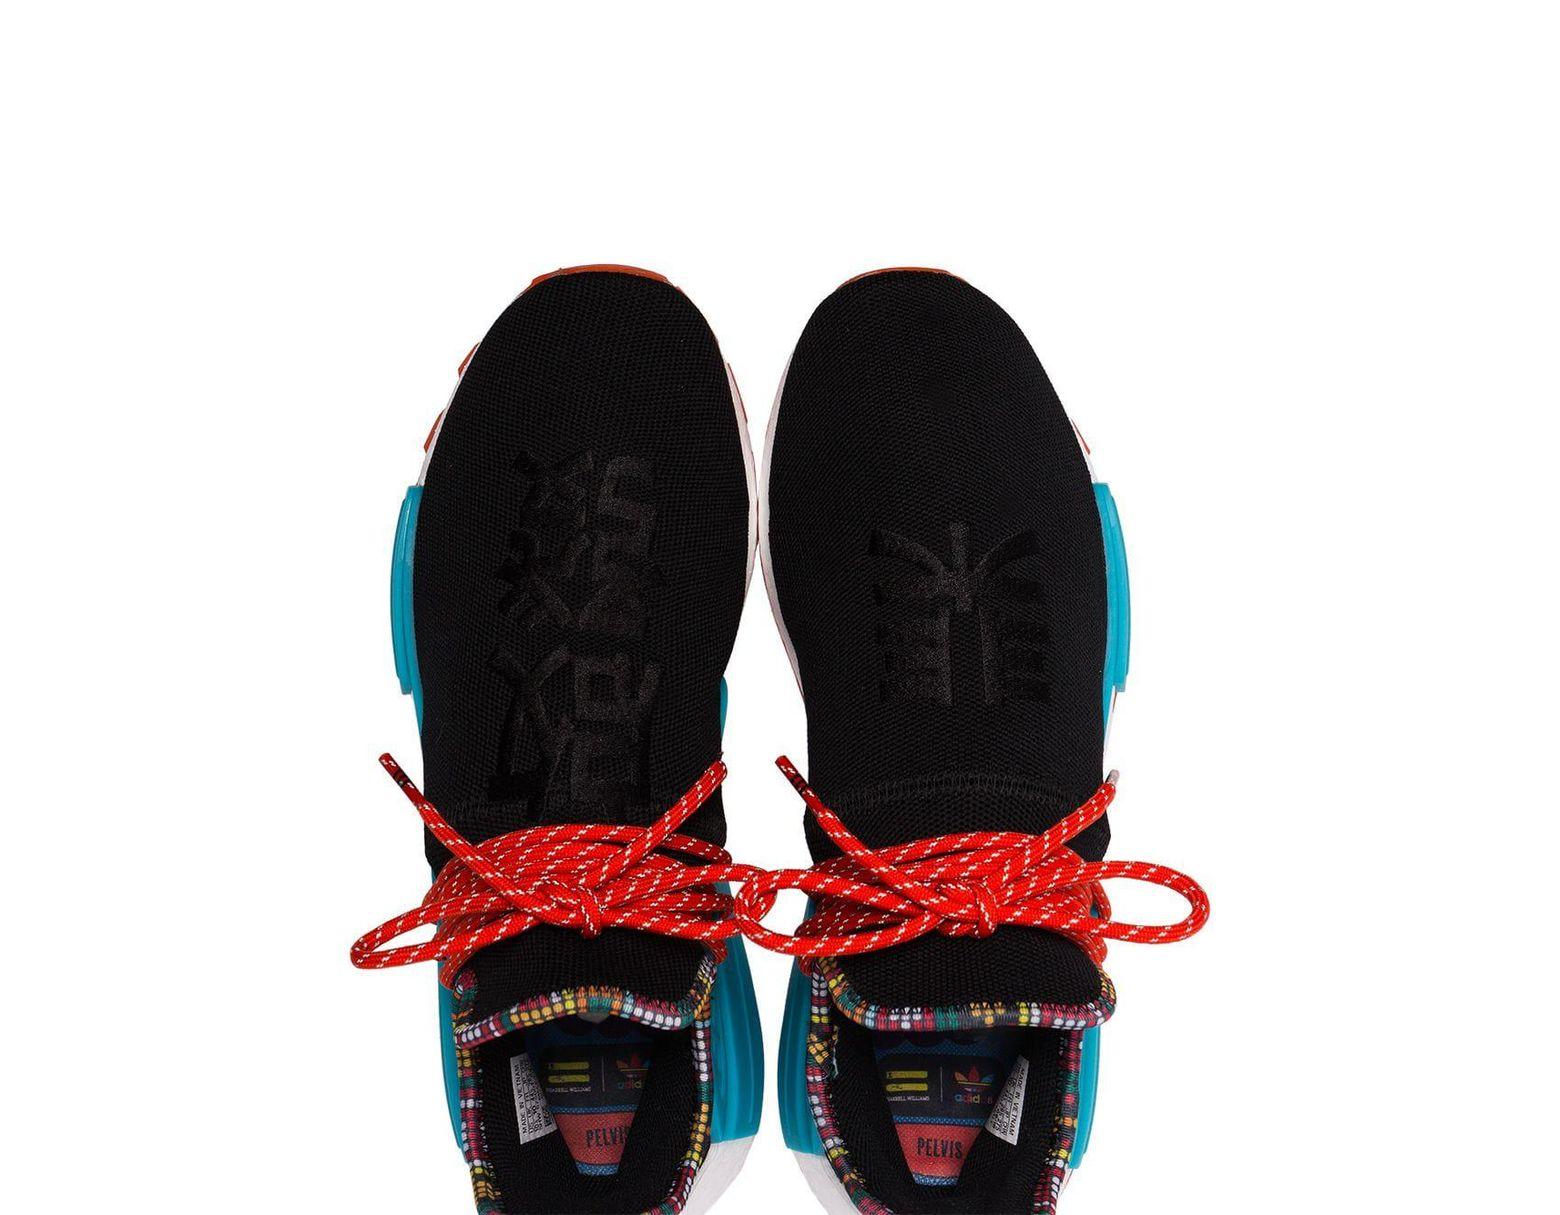 88dd096700bec Lyst - adidas X Pharrell Williams Black Human Body Nmd Sneakers in Black  for Men